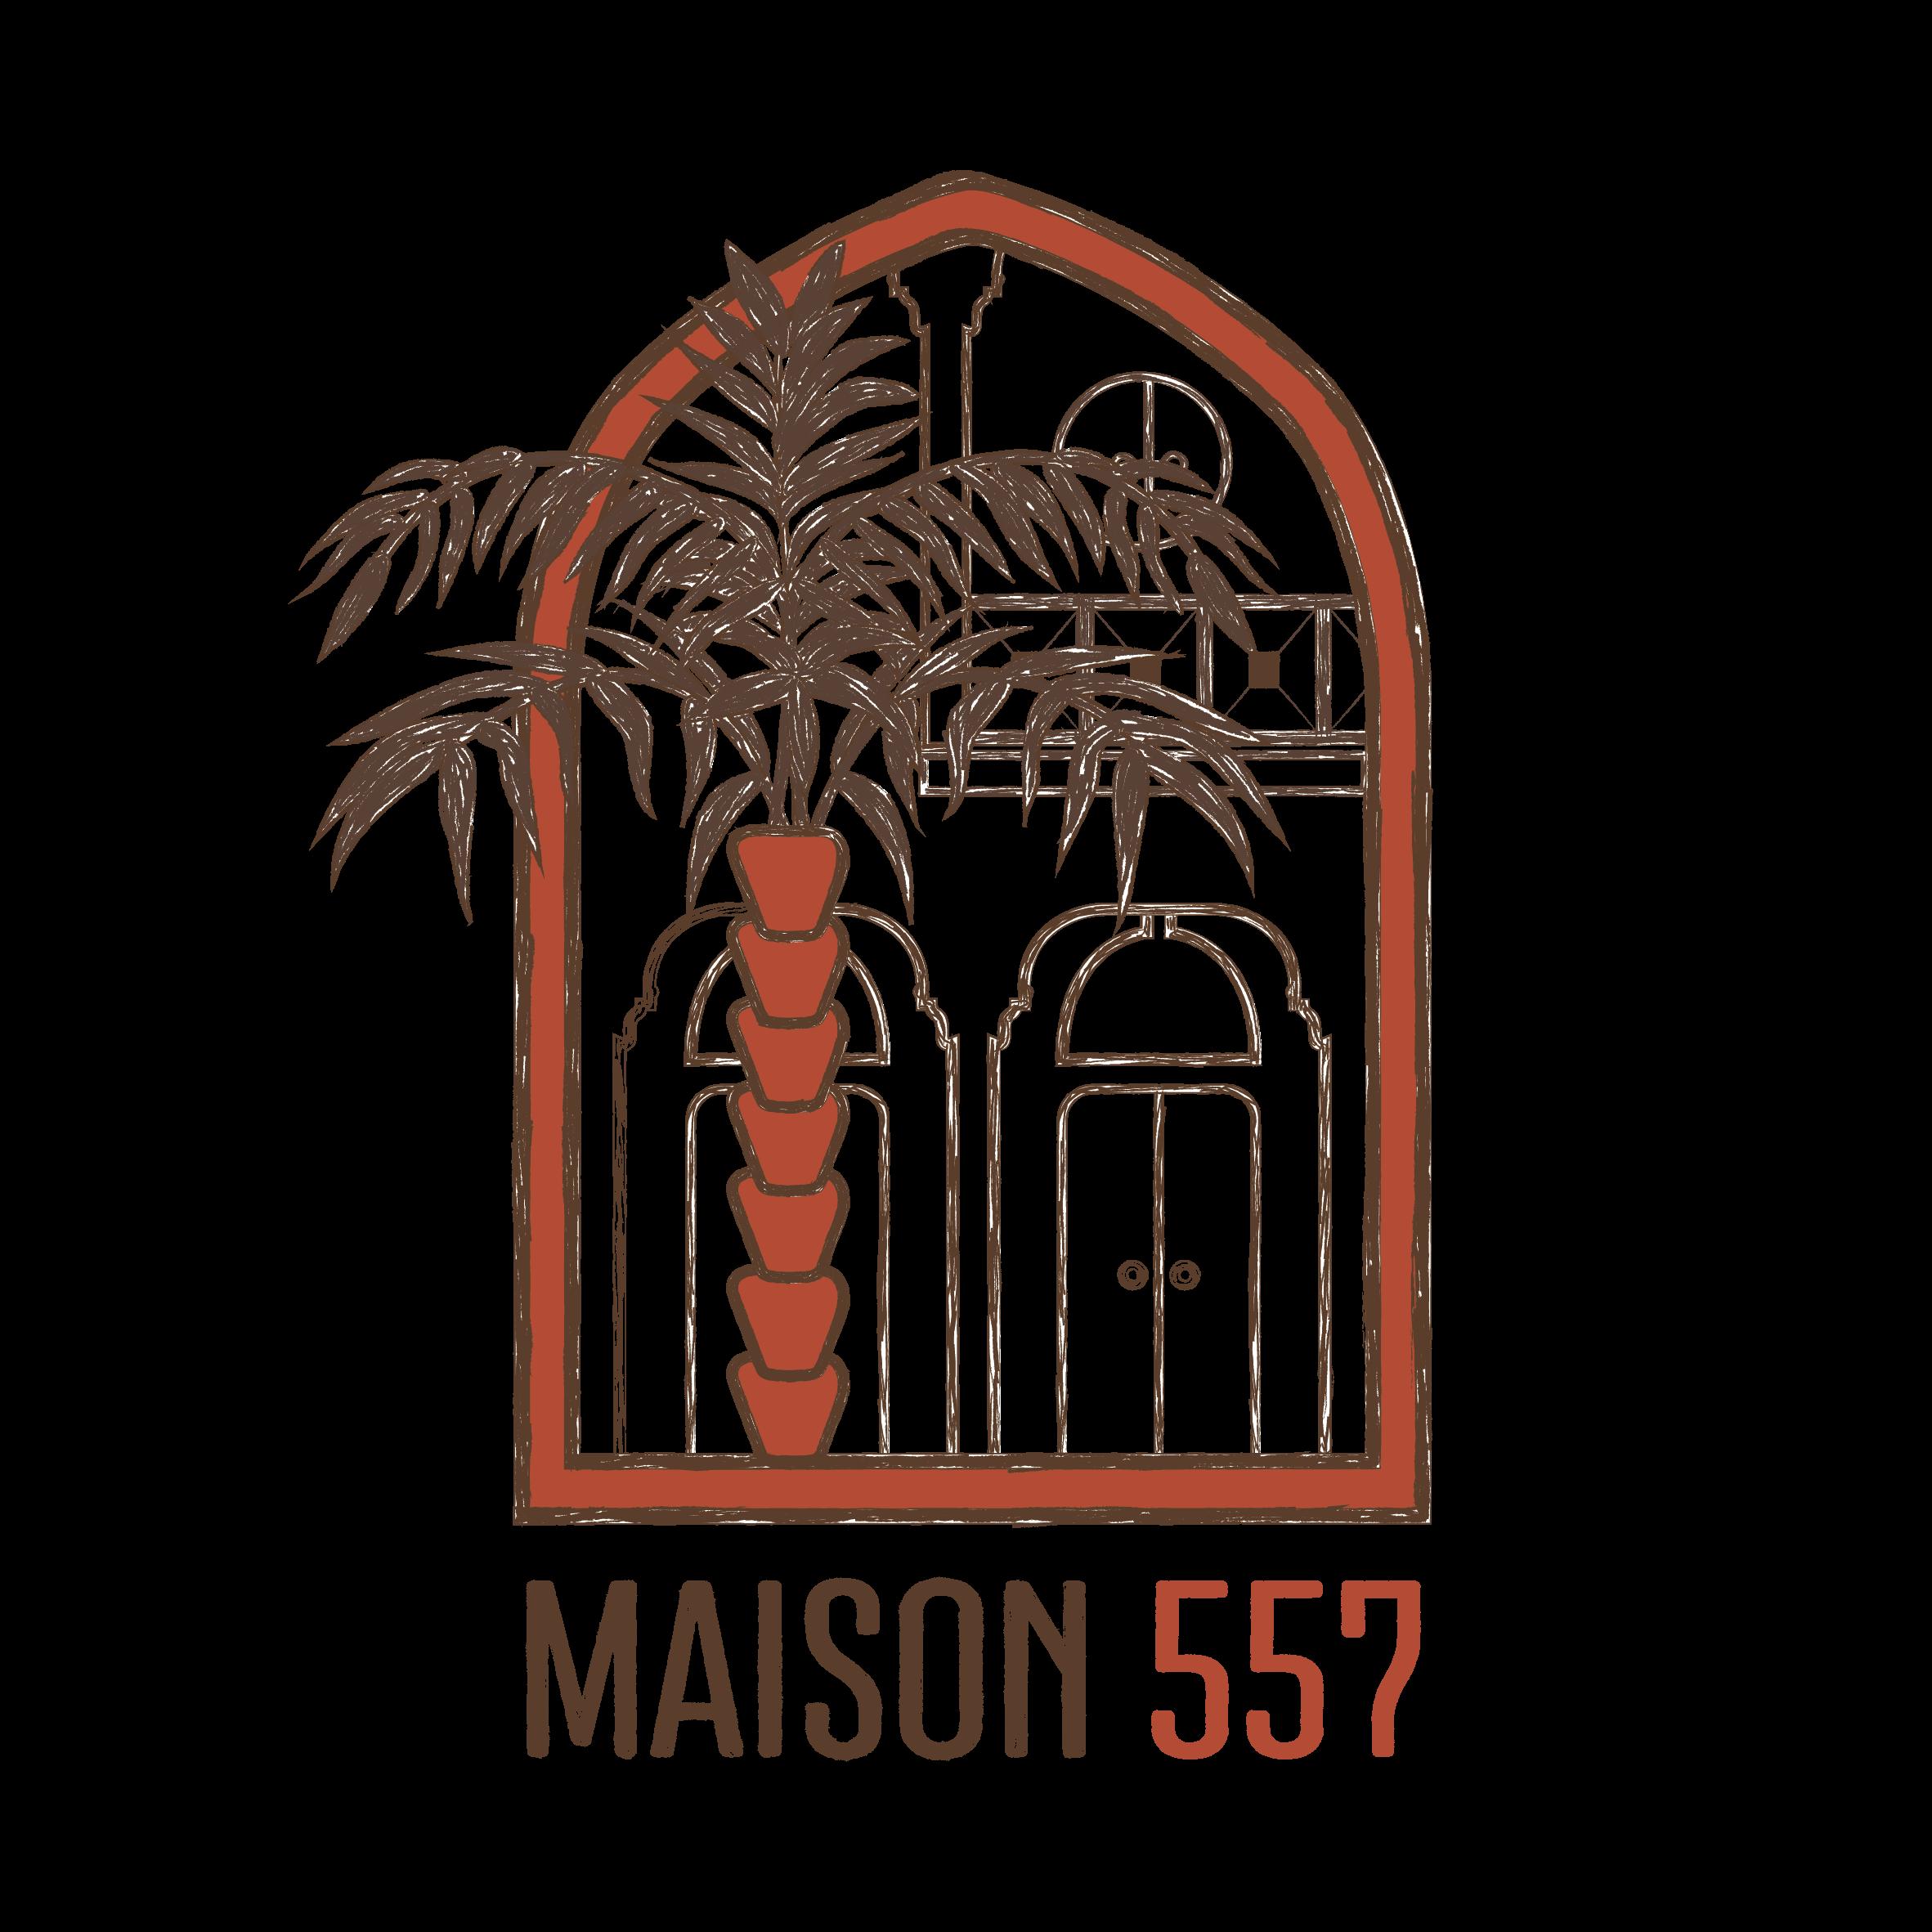 Maison 557 Logo